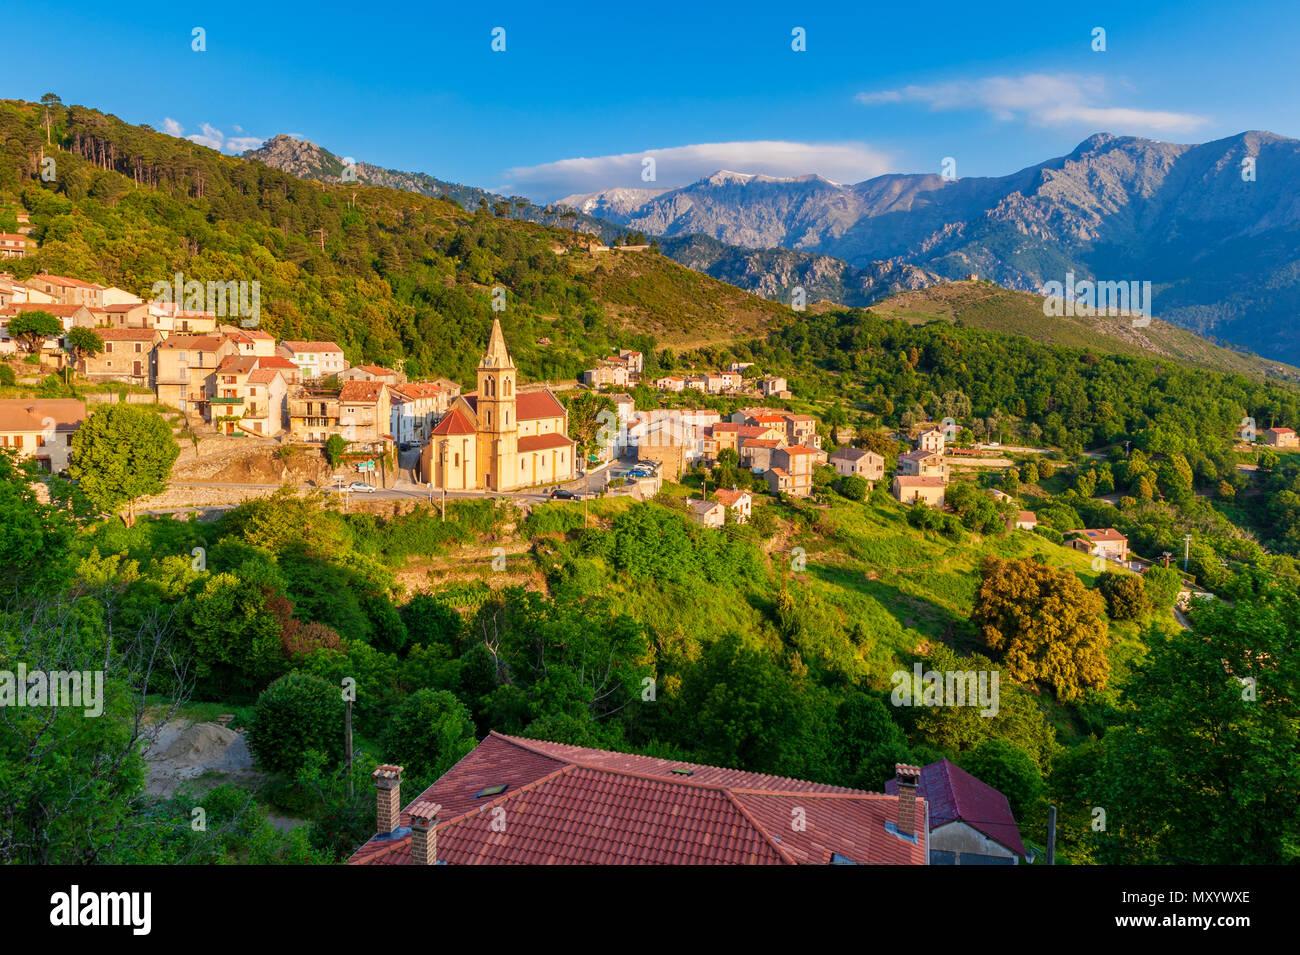 Village of Vivario, Corsica, France Stock Photo